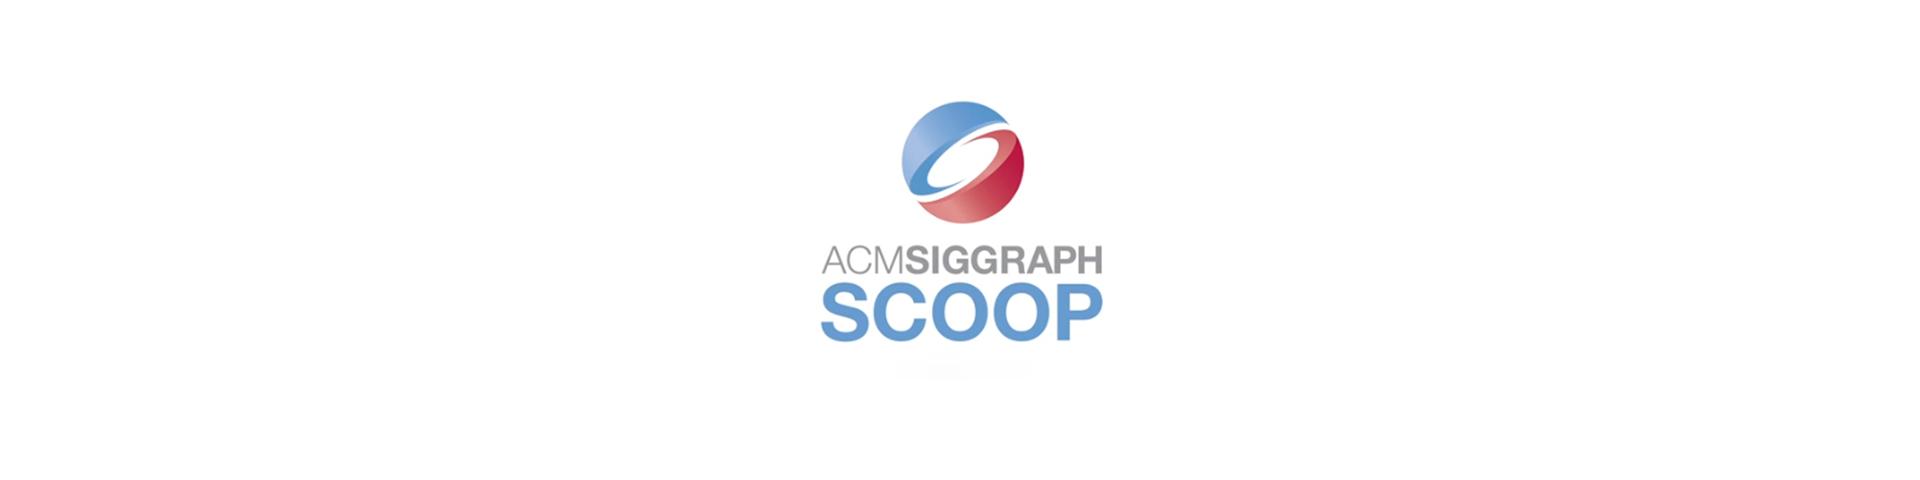 ACM SIGGRAPH Scoop Logo